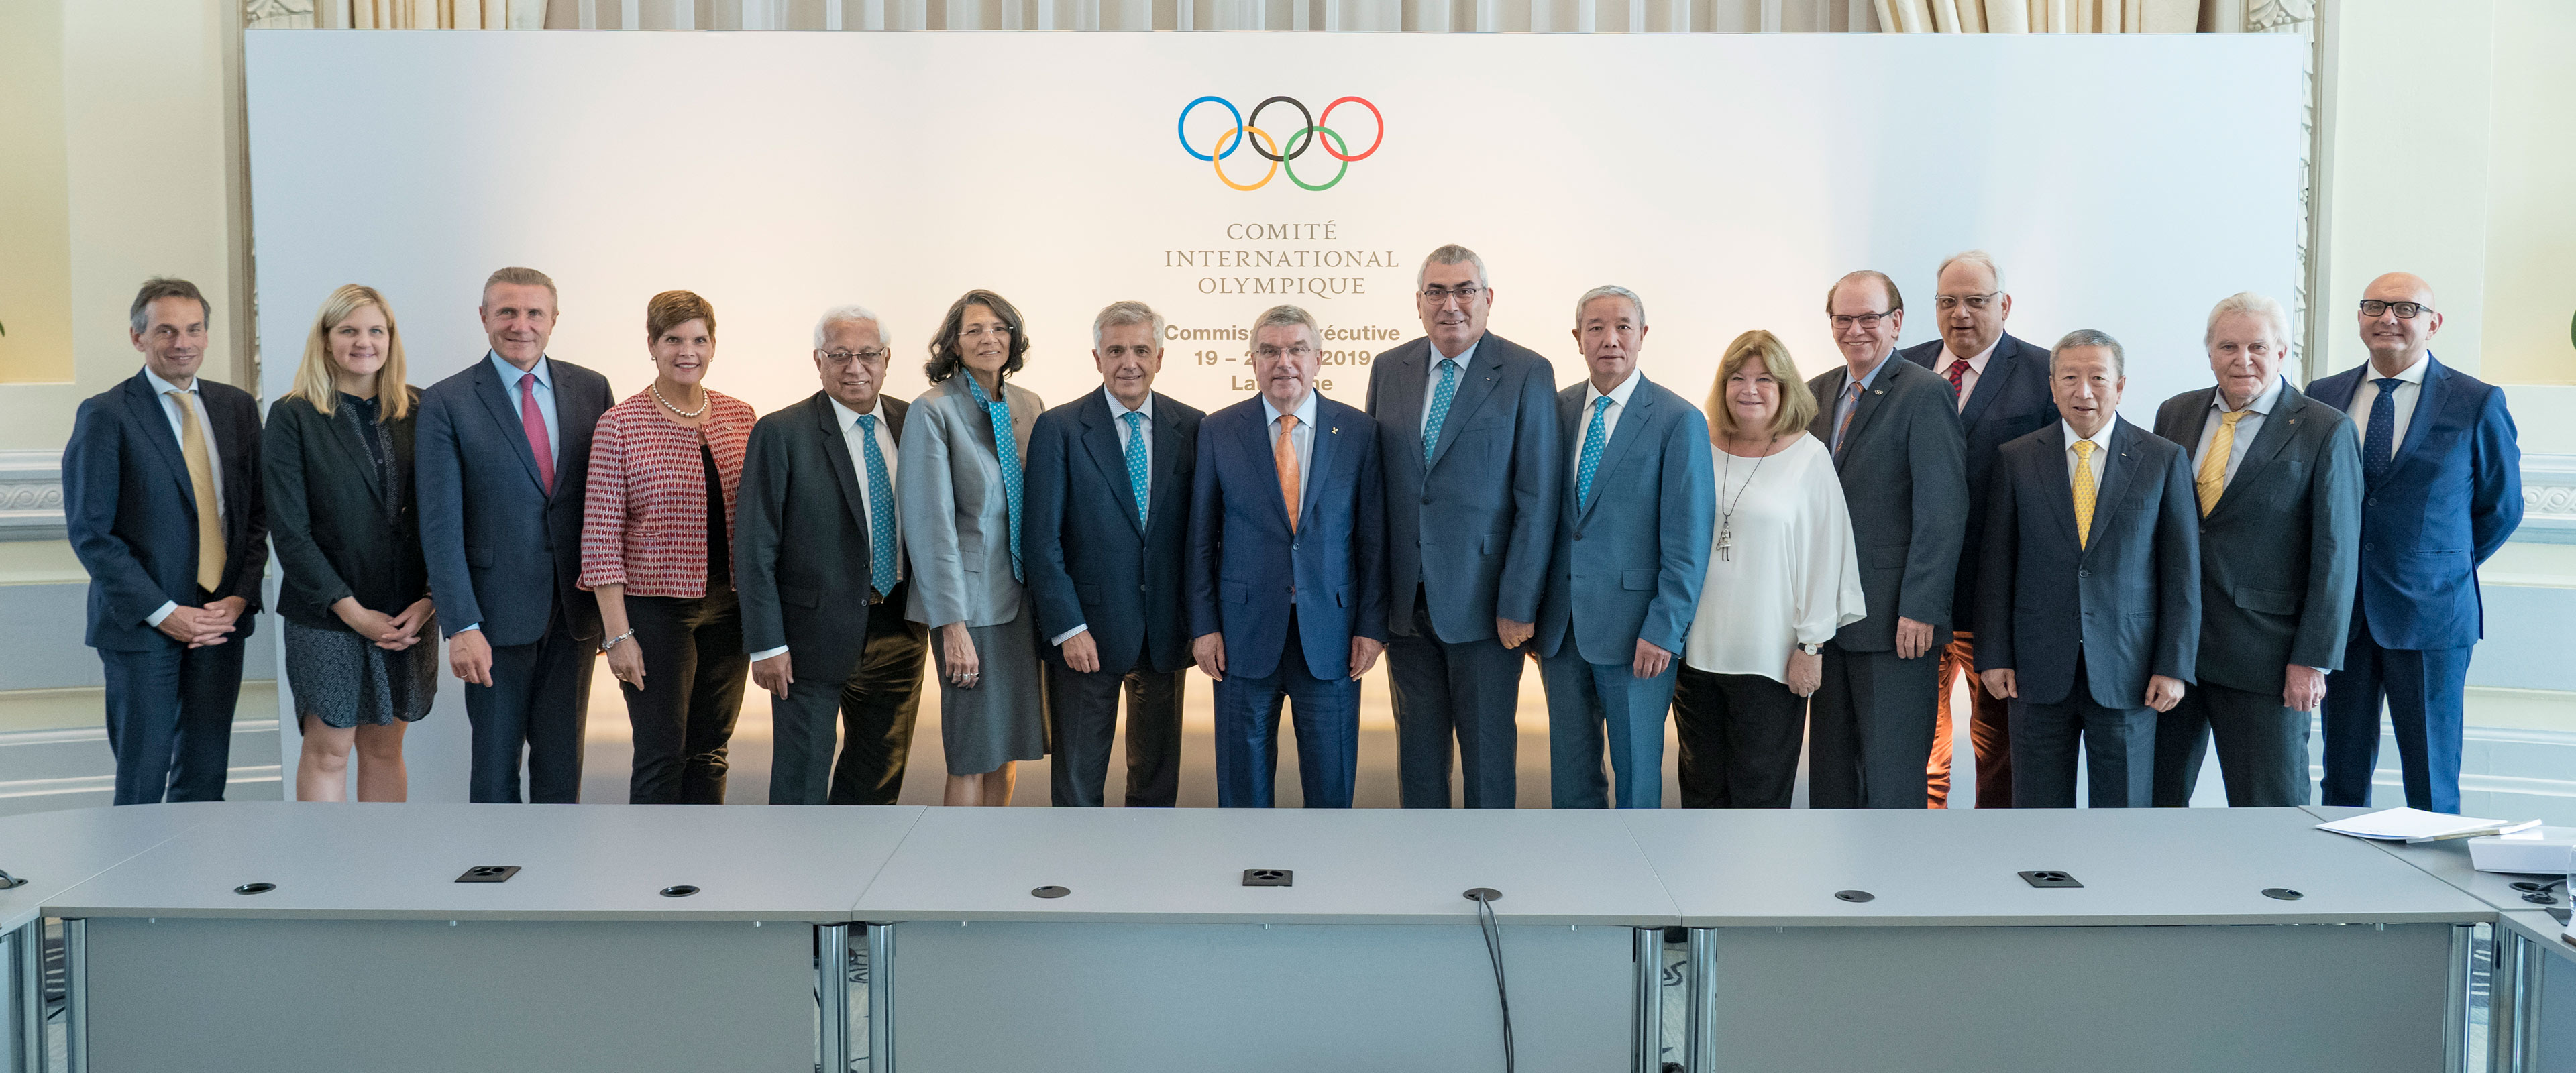 IOC Executive Board KreedOn